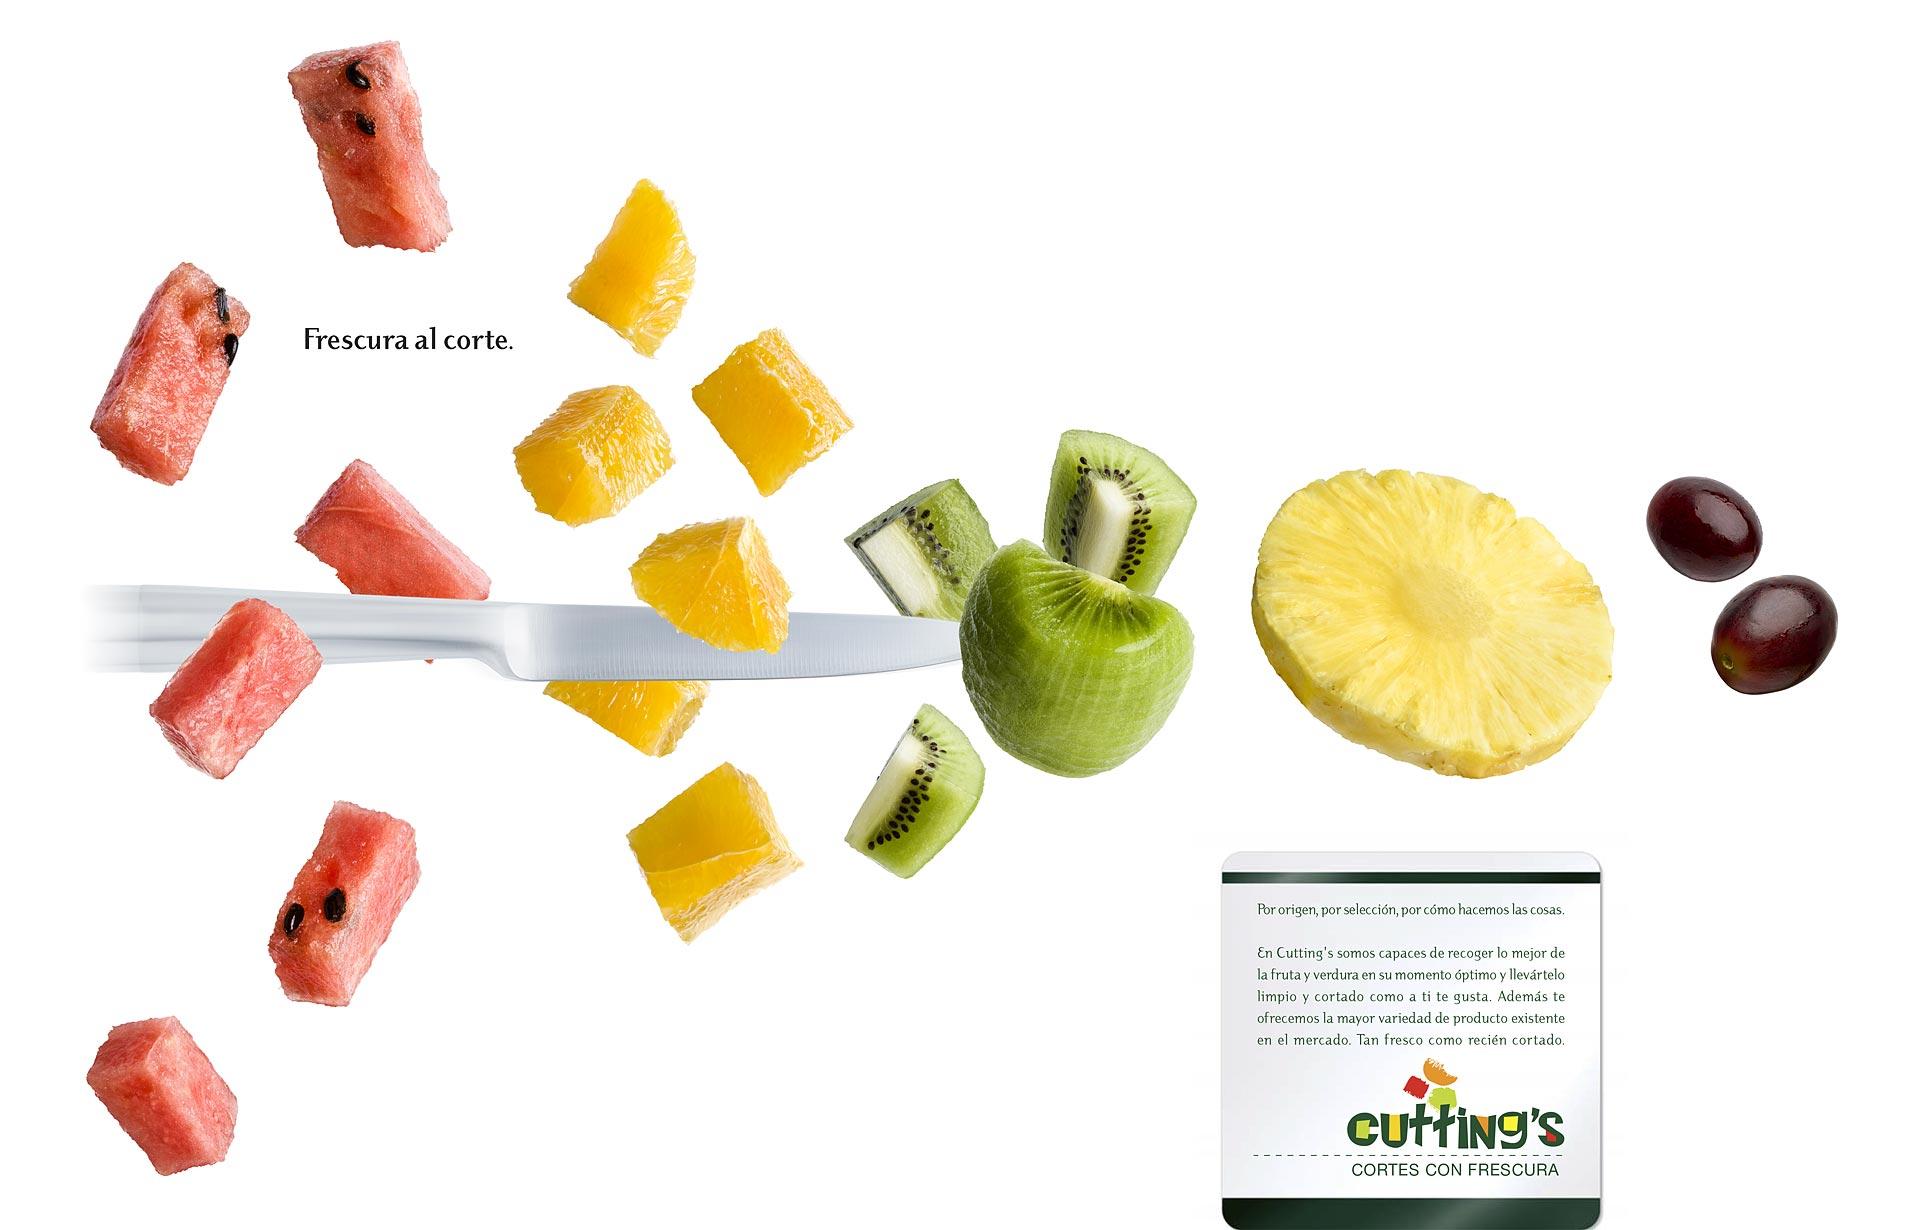 Cutting's